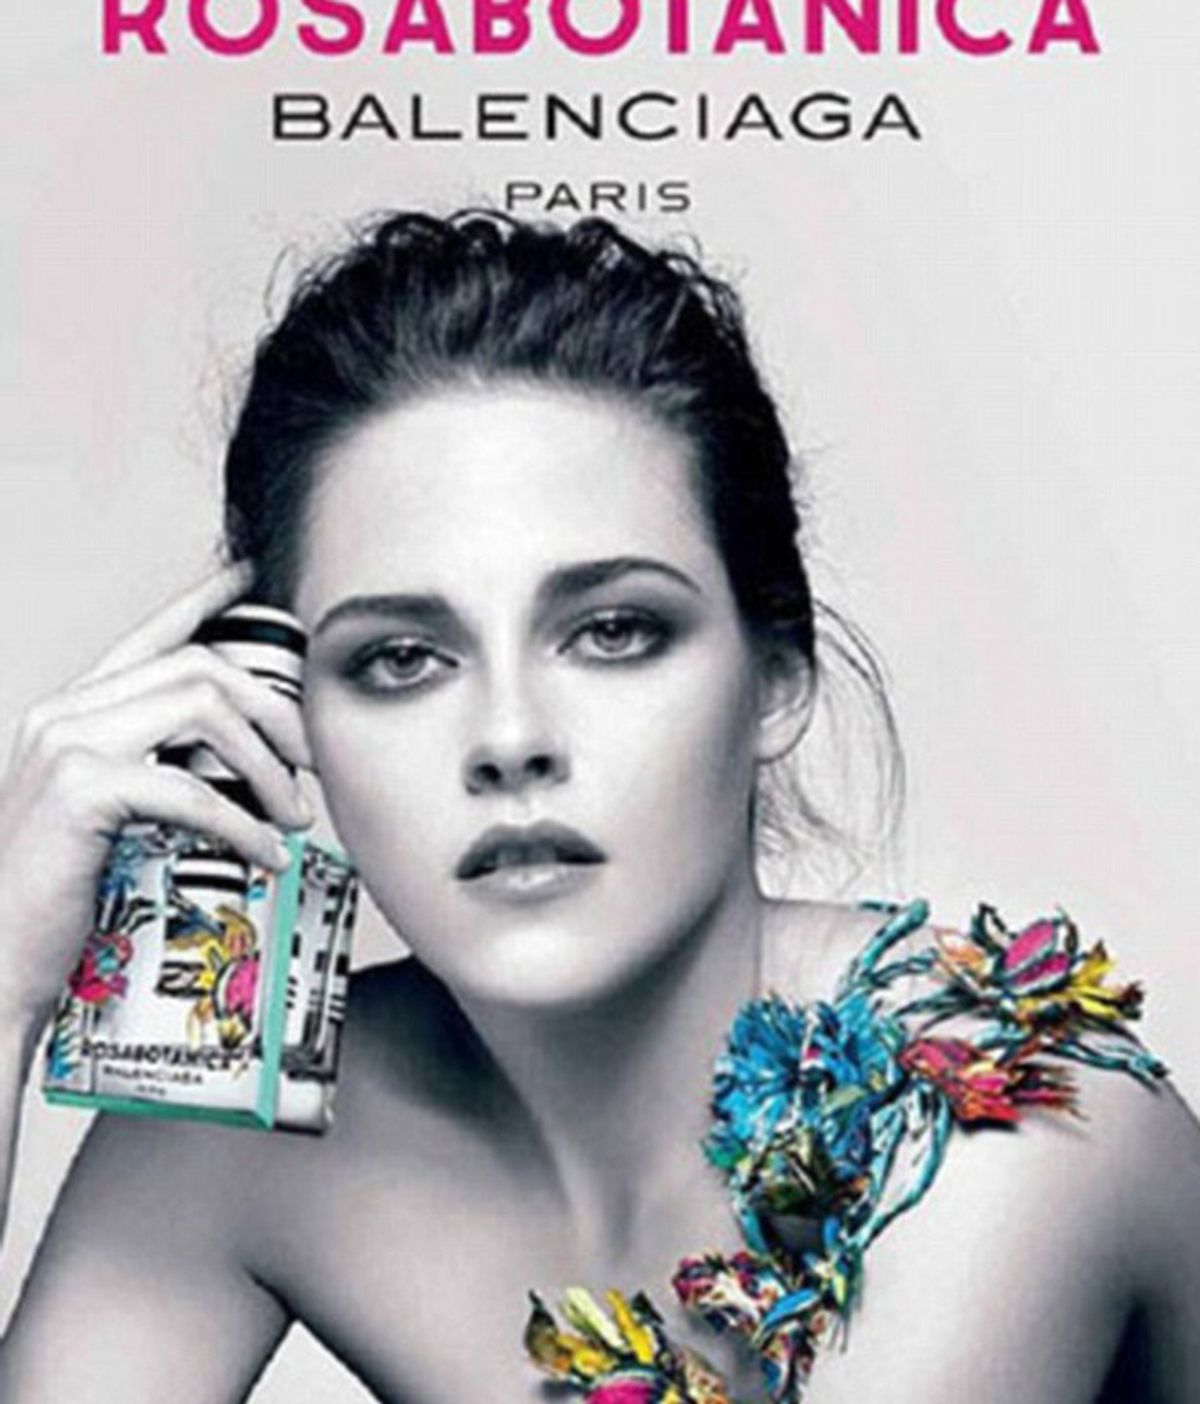 Kristen Stewart, musa de Balenciaga